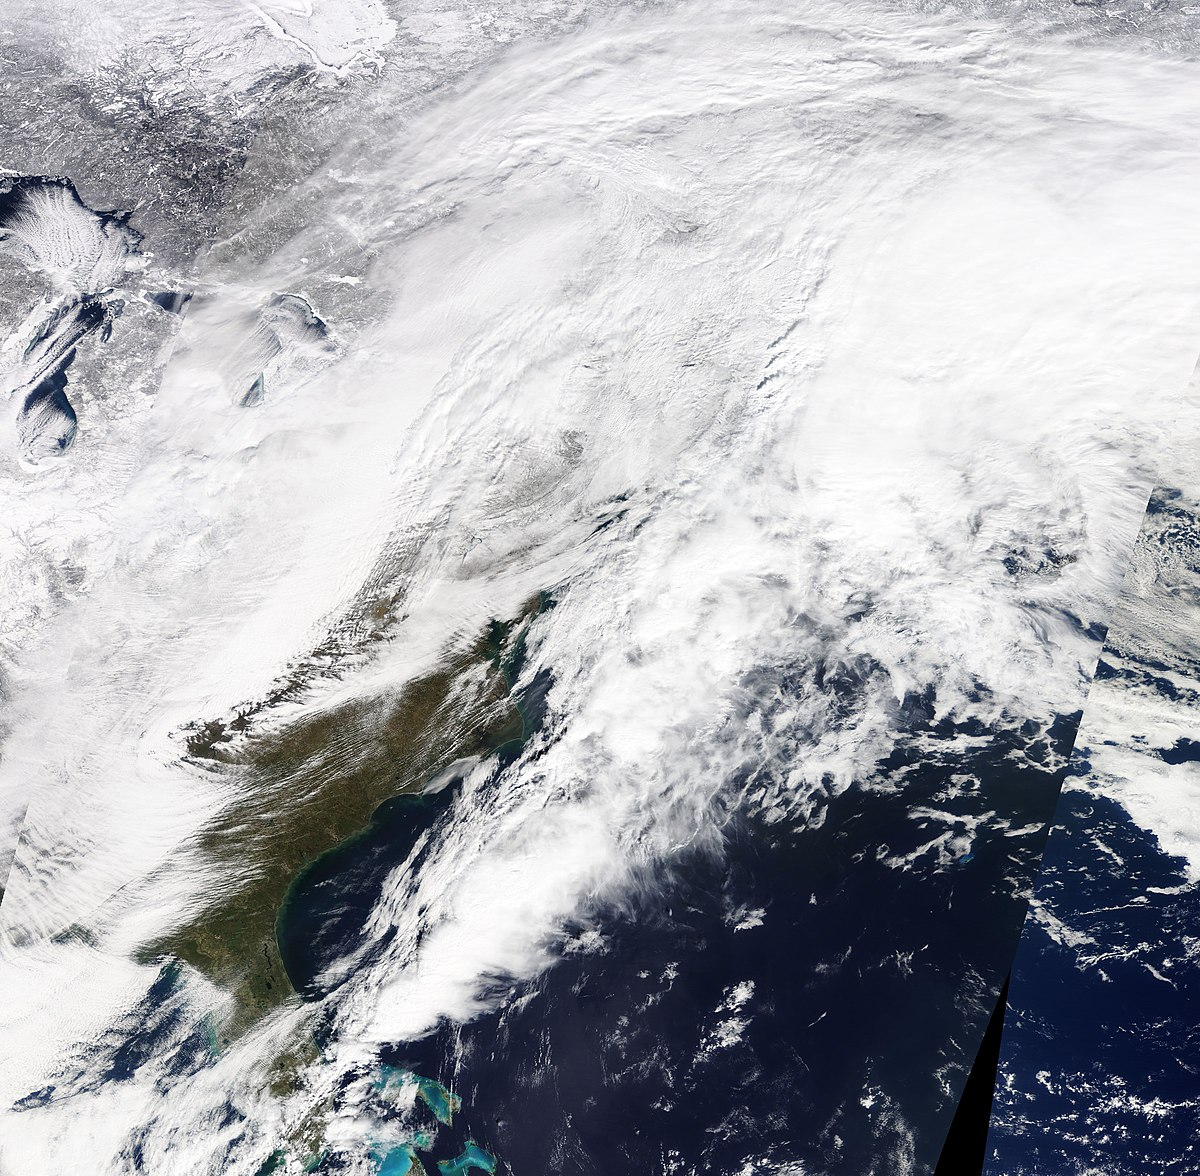 Event Report: Winter Storm Uri